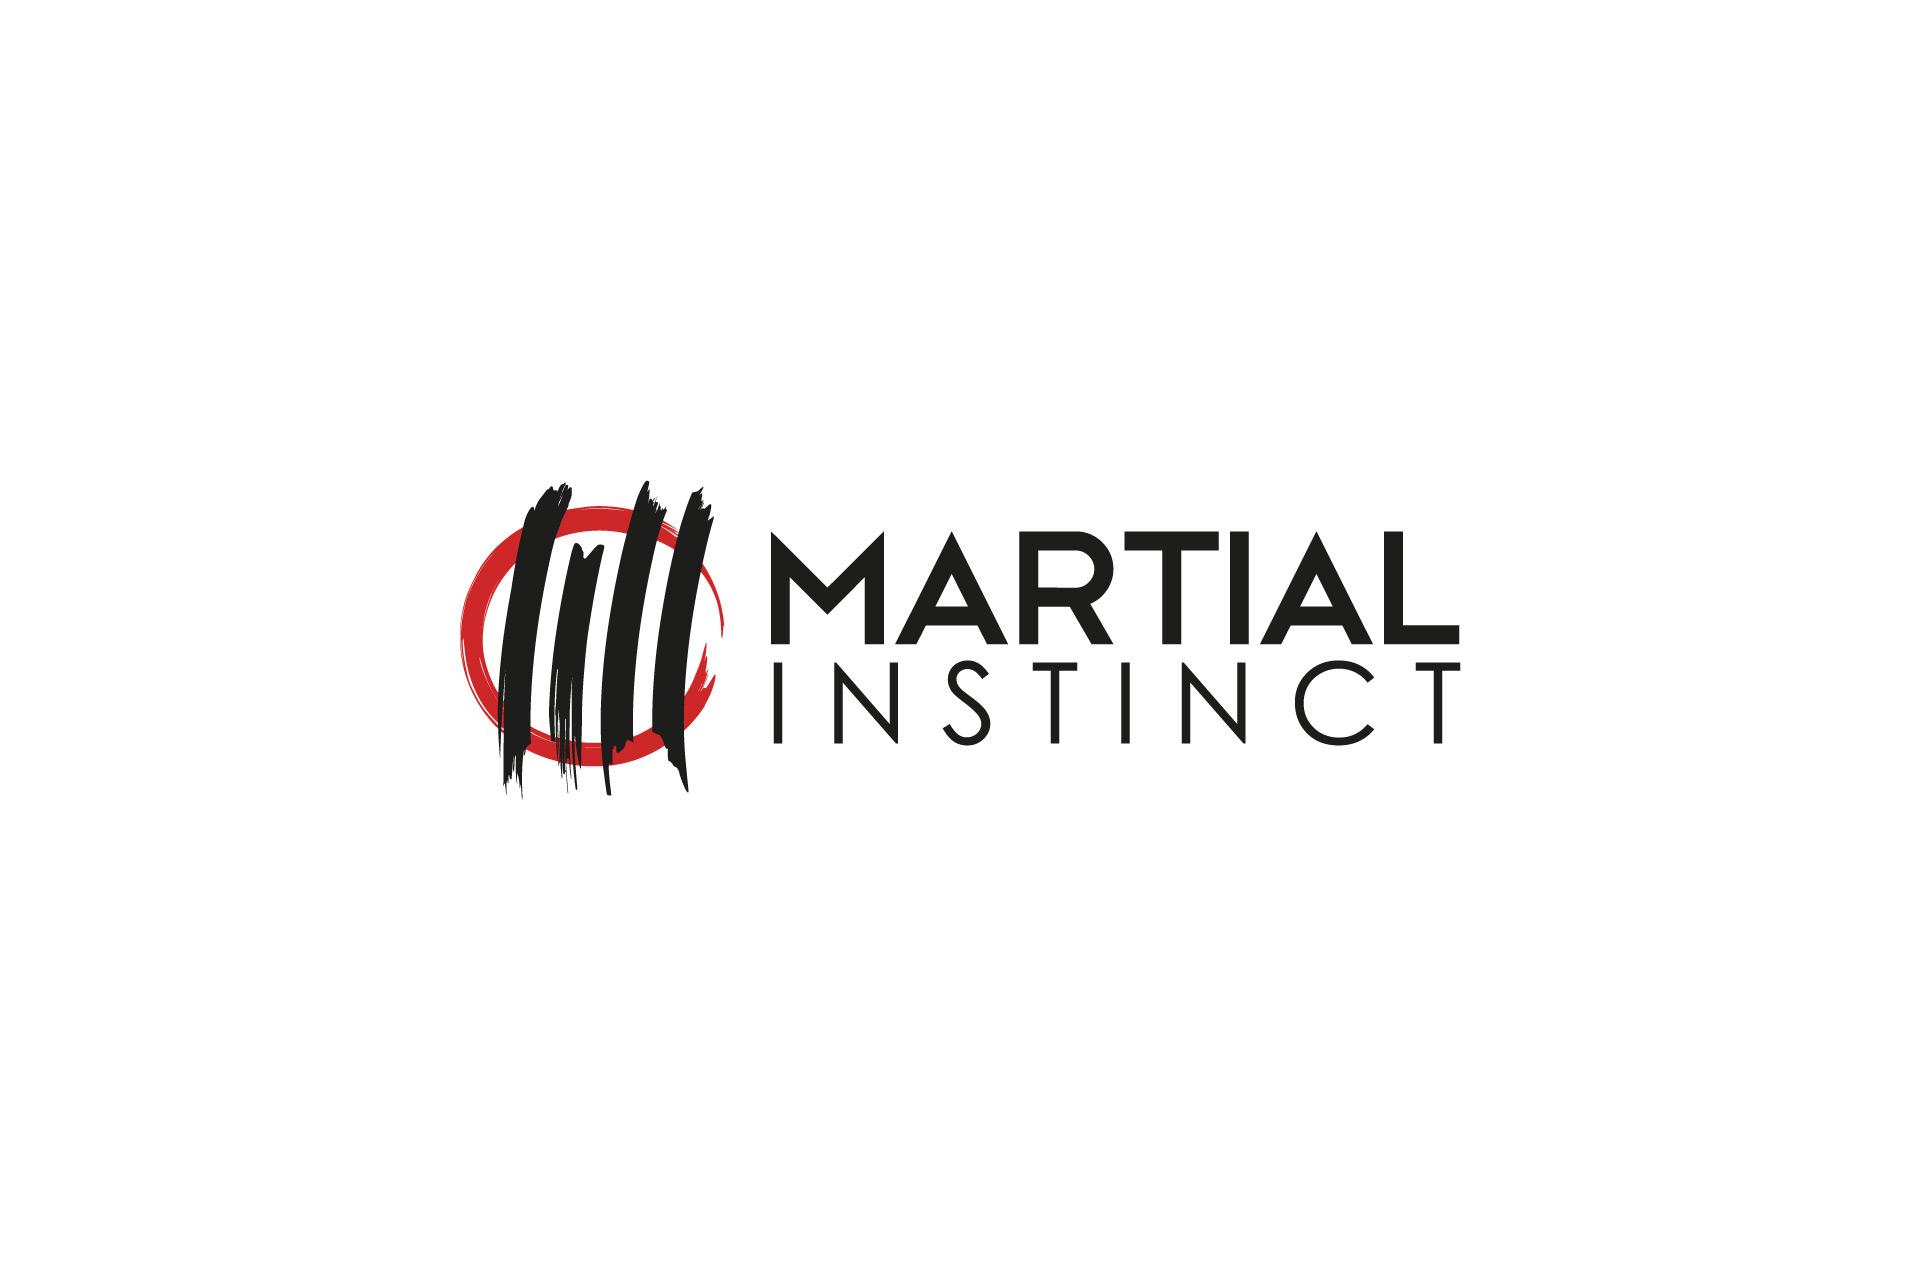 (c) Martial-instinct.de